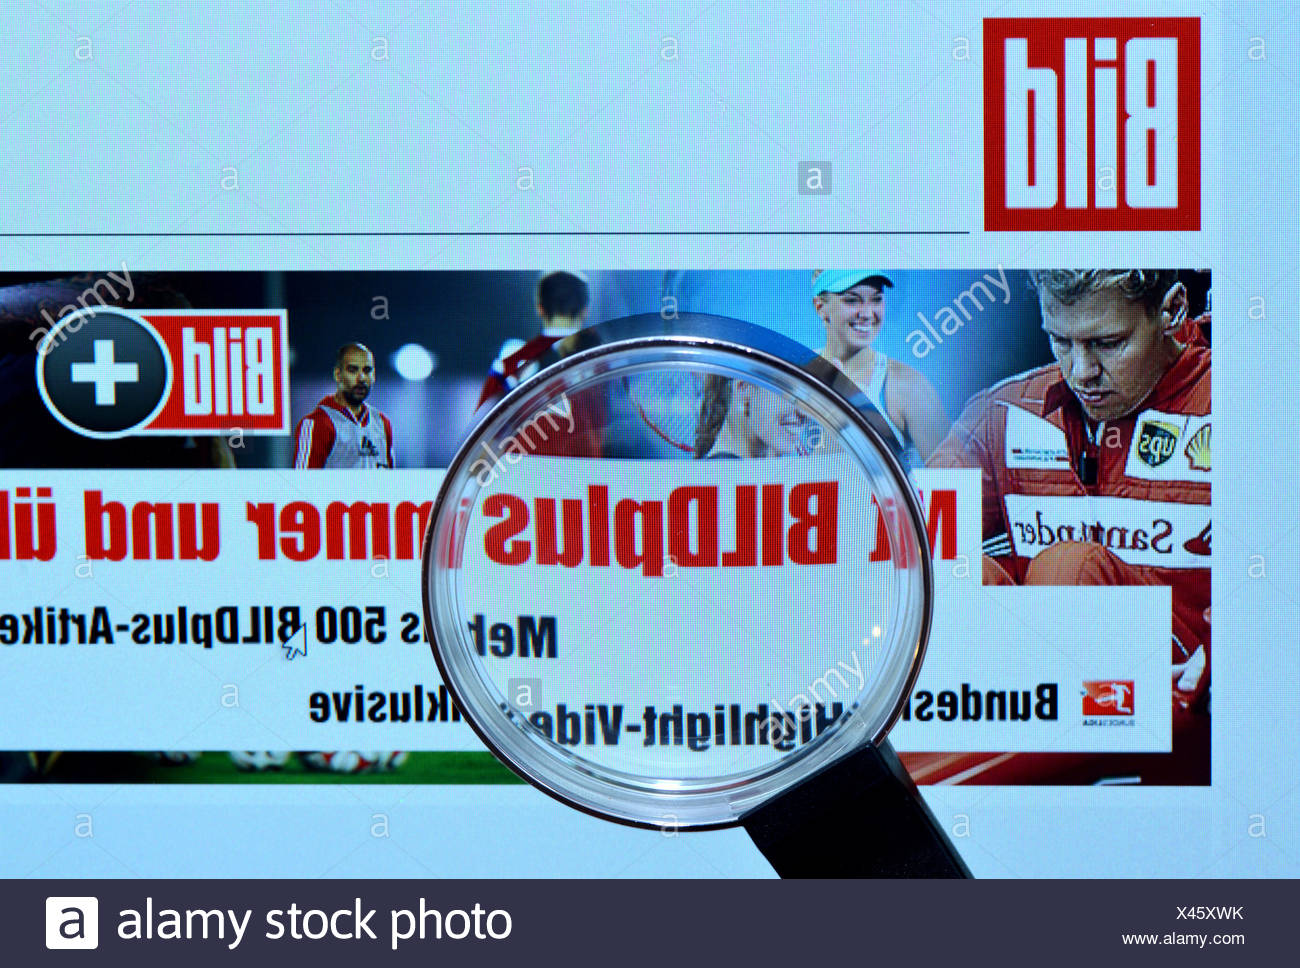 Bildschirm, Internet, Lupe, bild.de, Bildzeitung - Stock Image